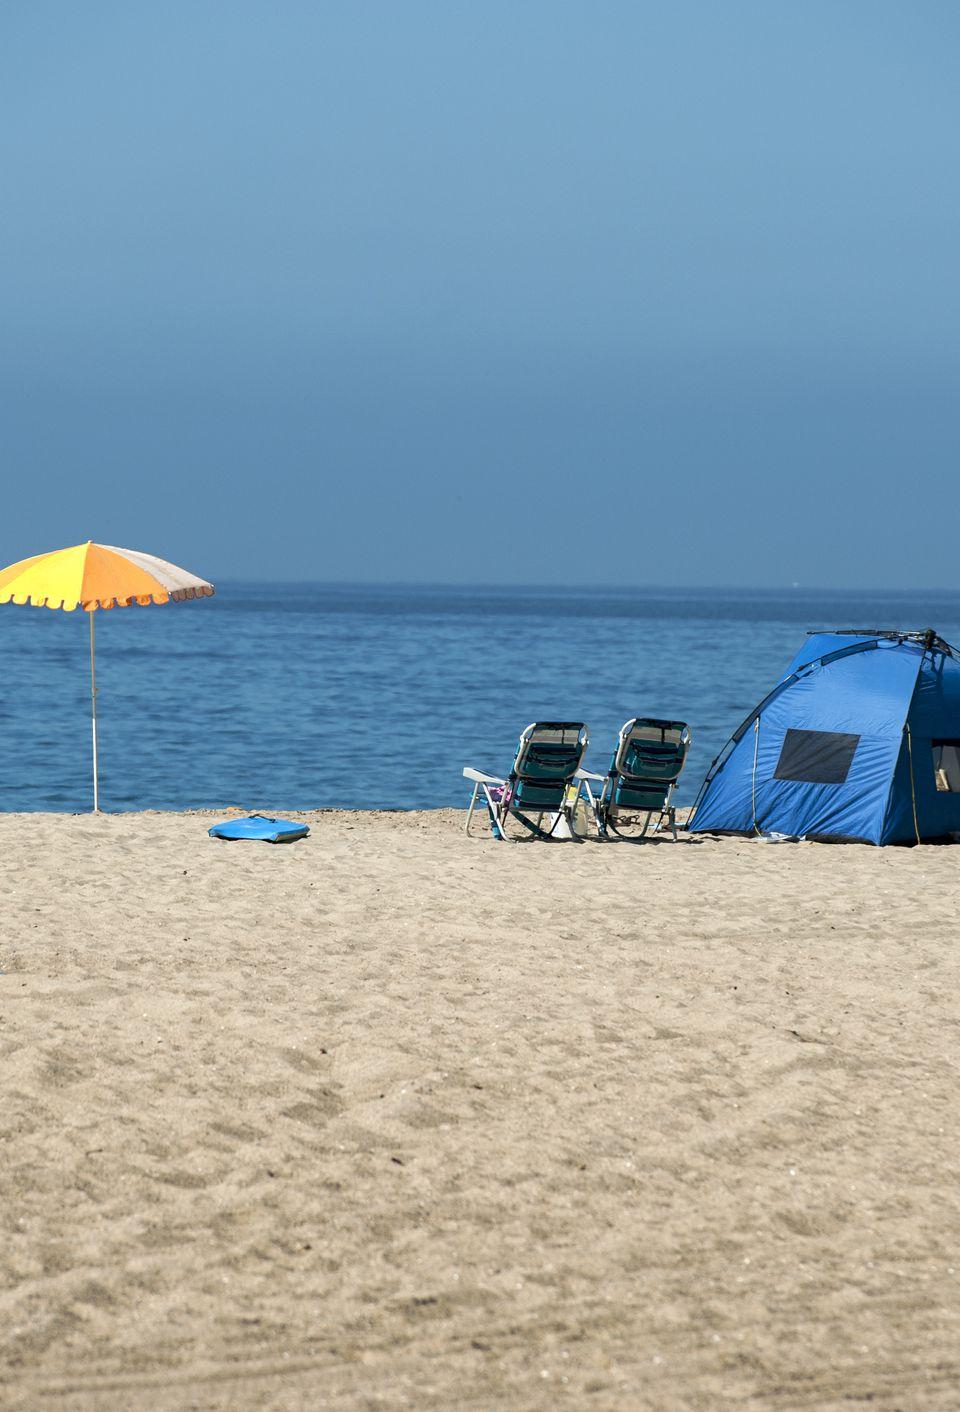 Parasol and tent at a beach campsite, Point Mugu Beach, Ventura County, California